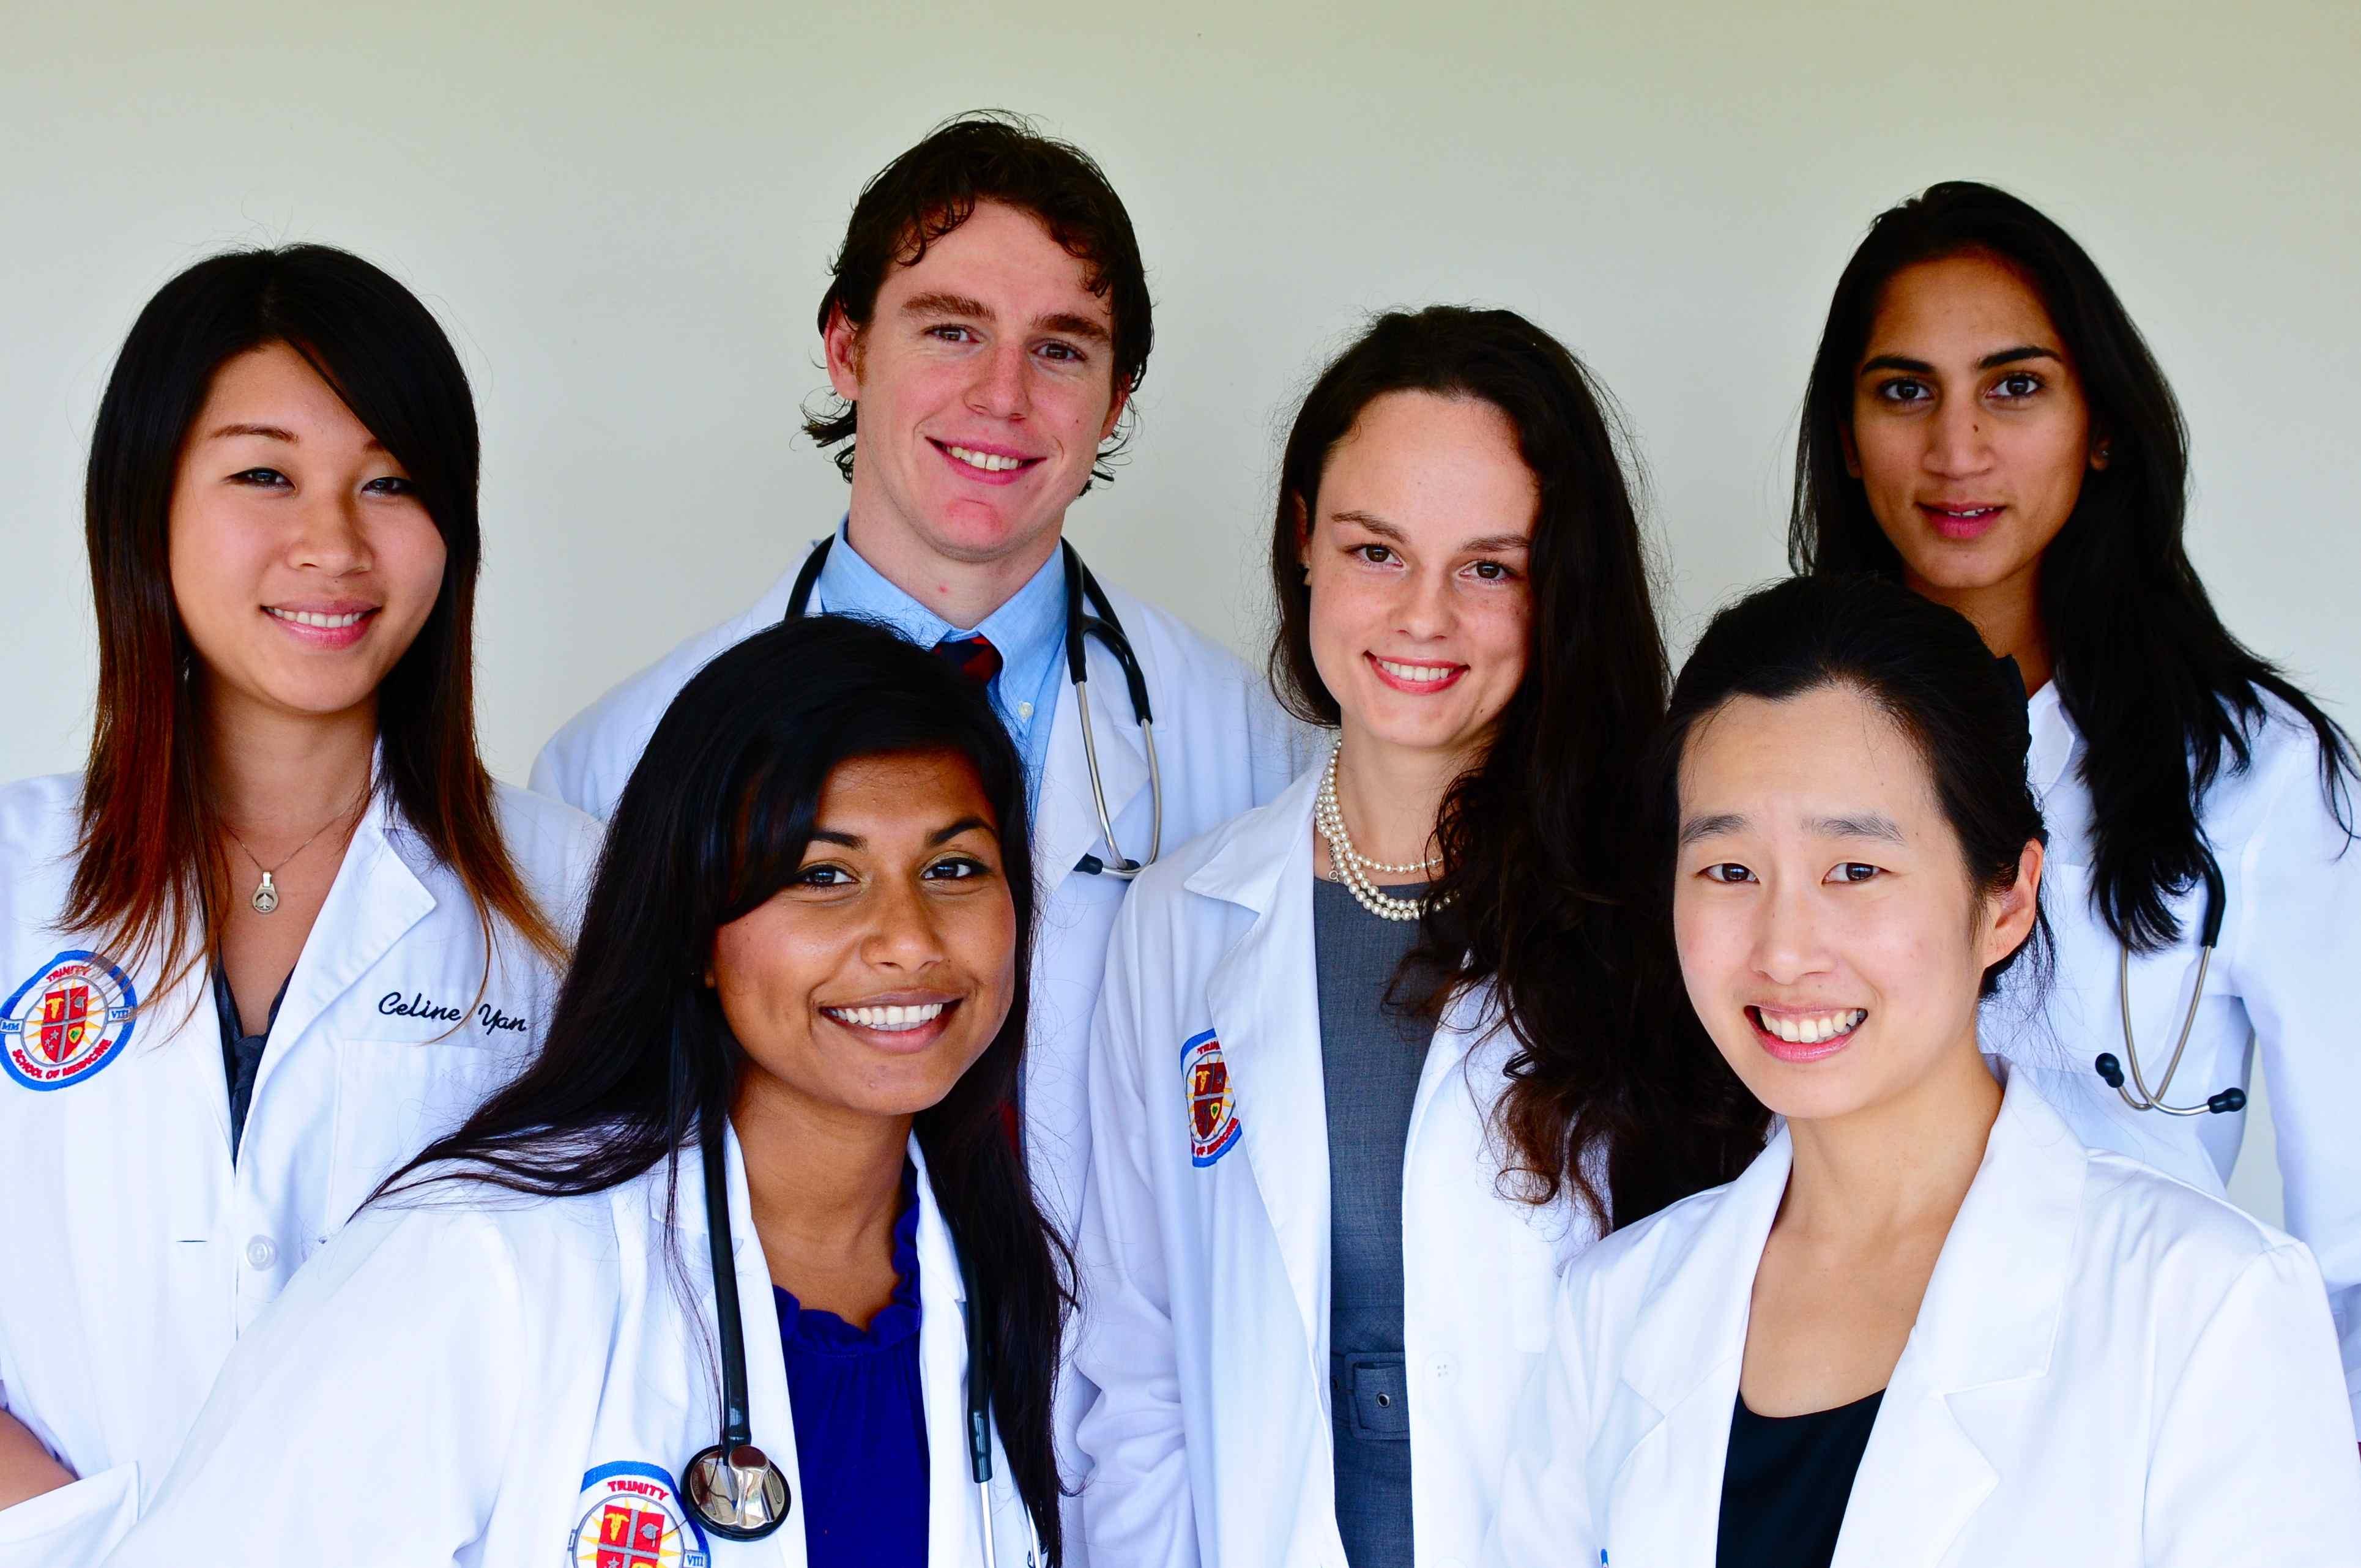 Video: New Dean's Goals for Caribbean Medical School